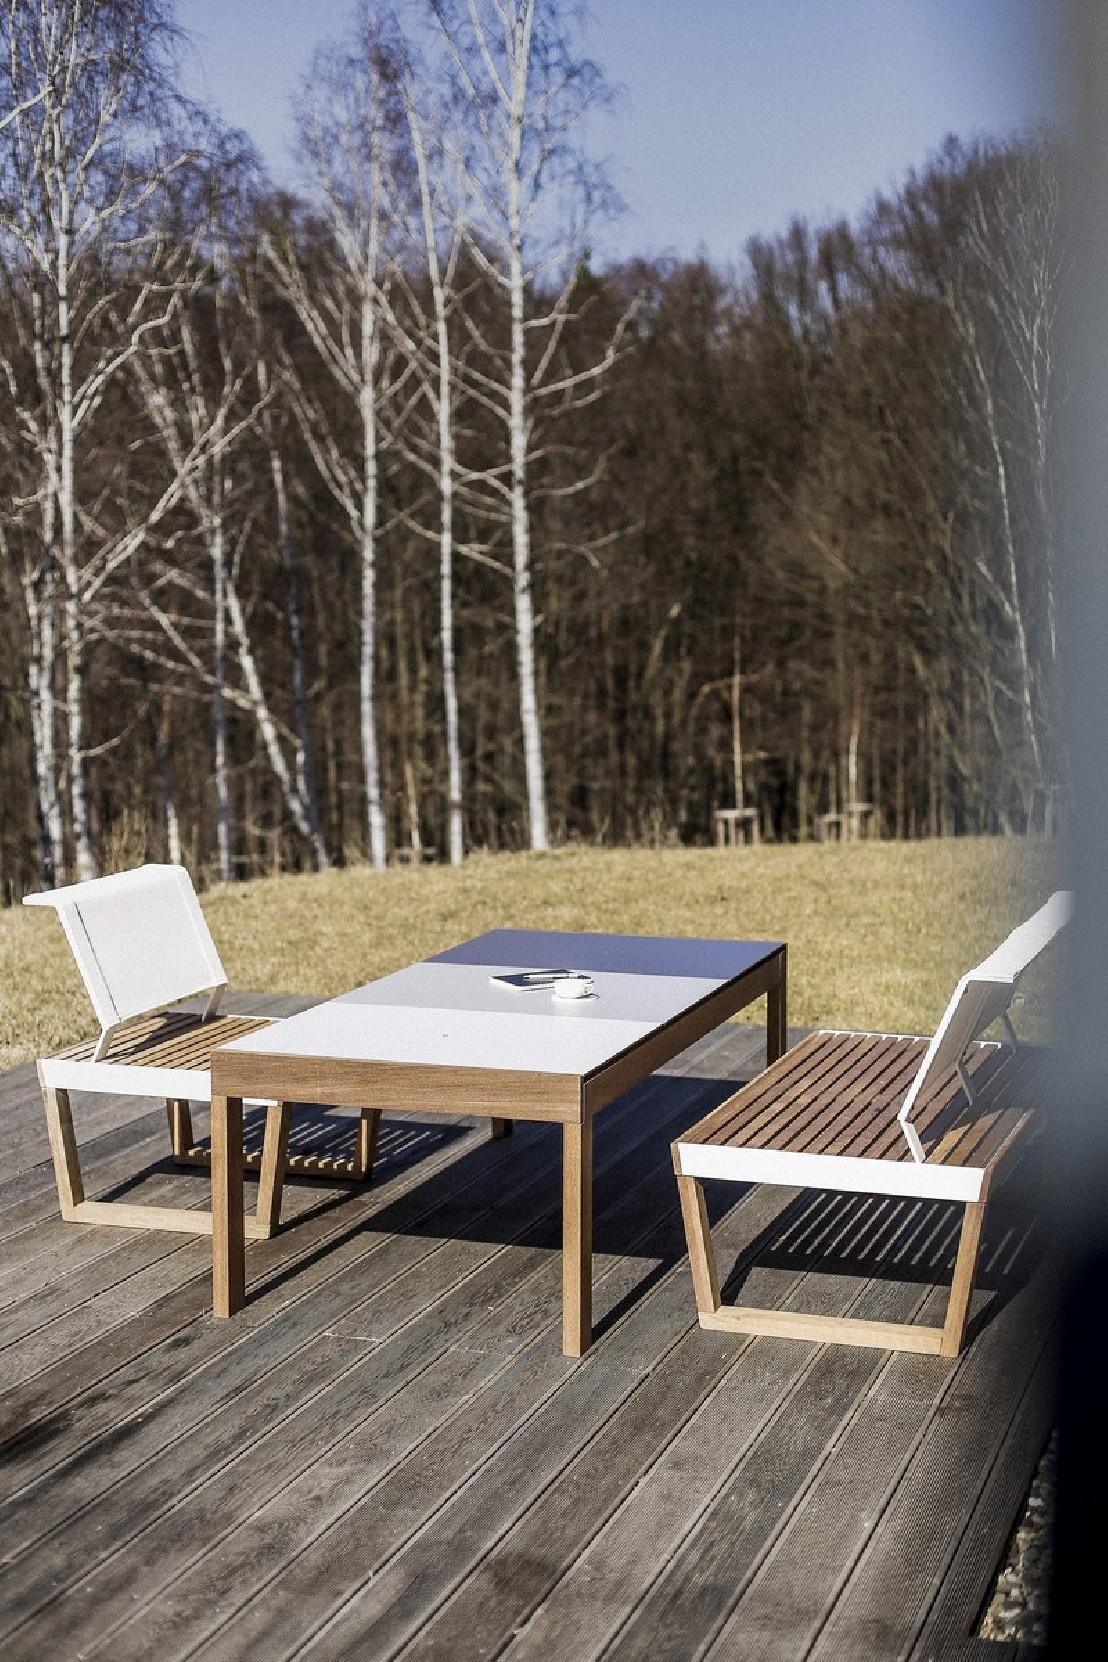 Fauteuil Extrieur De Jardin BARKA Design En Bois Massif